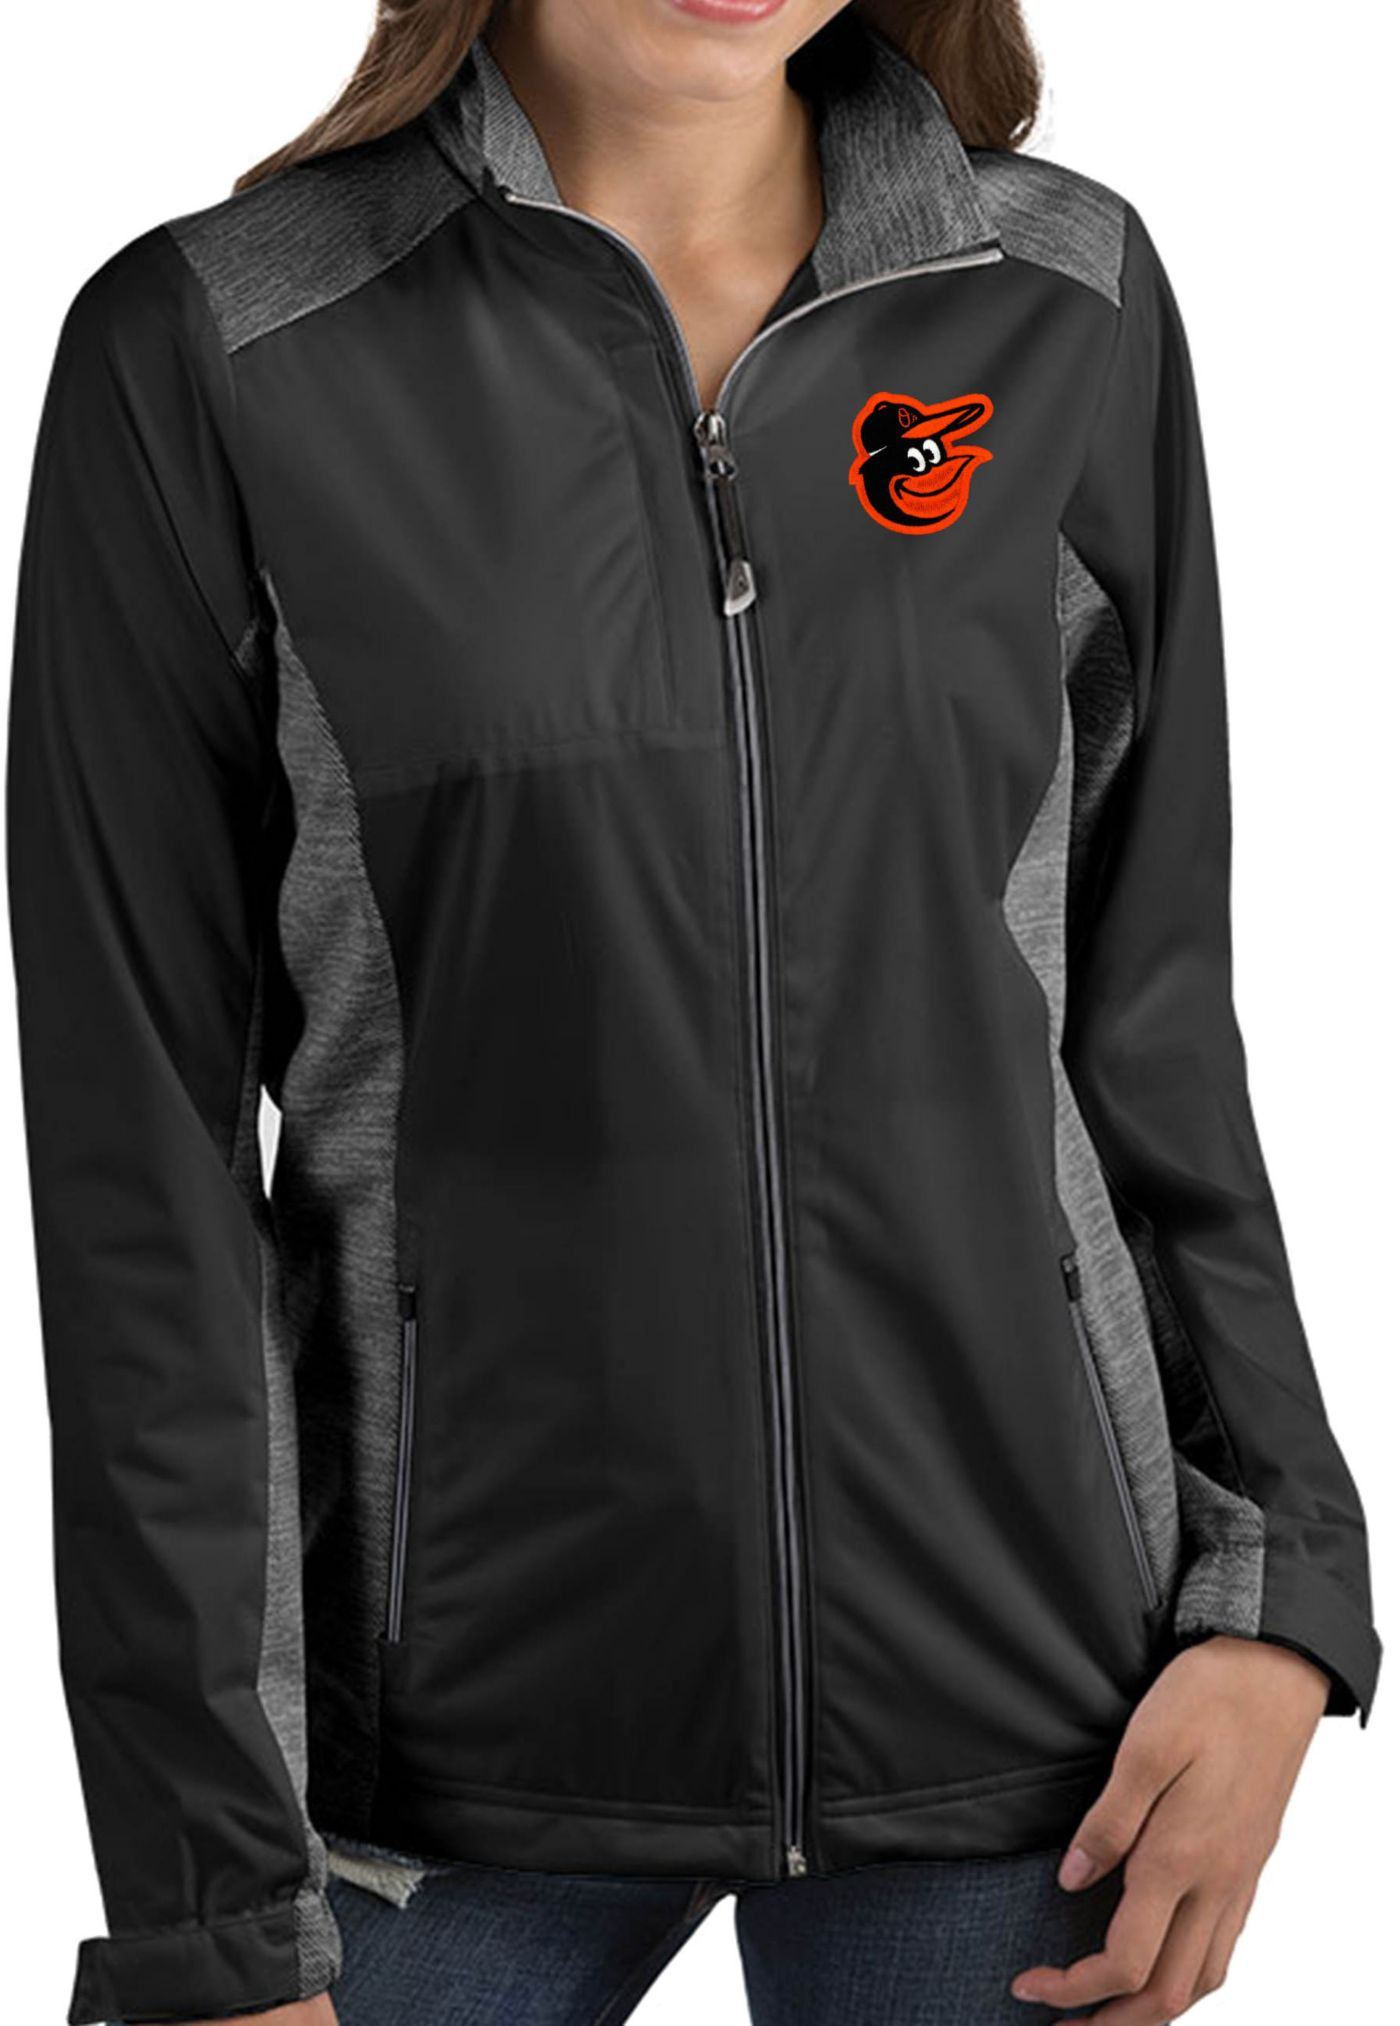 Antigua Women's Baltimore Orioles Revolve Black Full-Zip Jacket